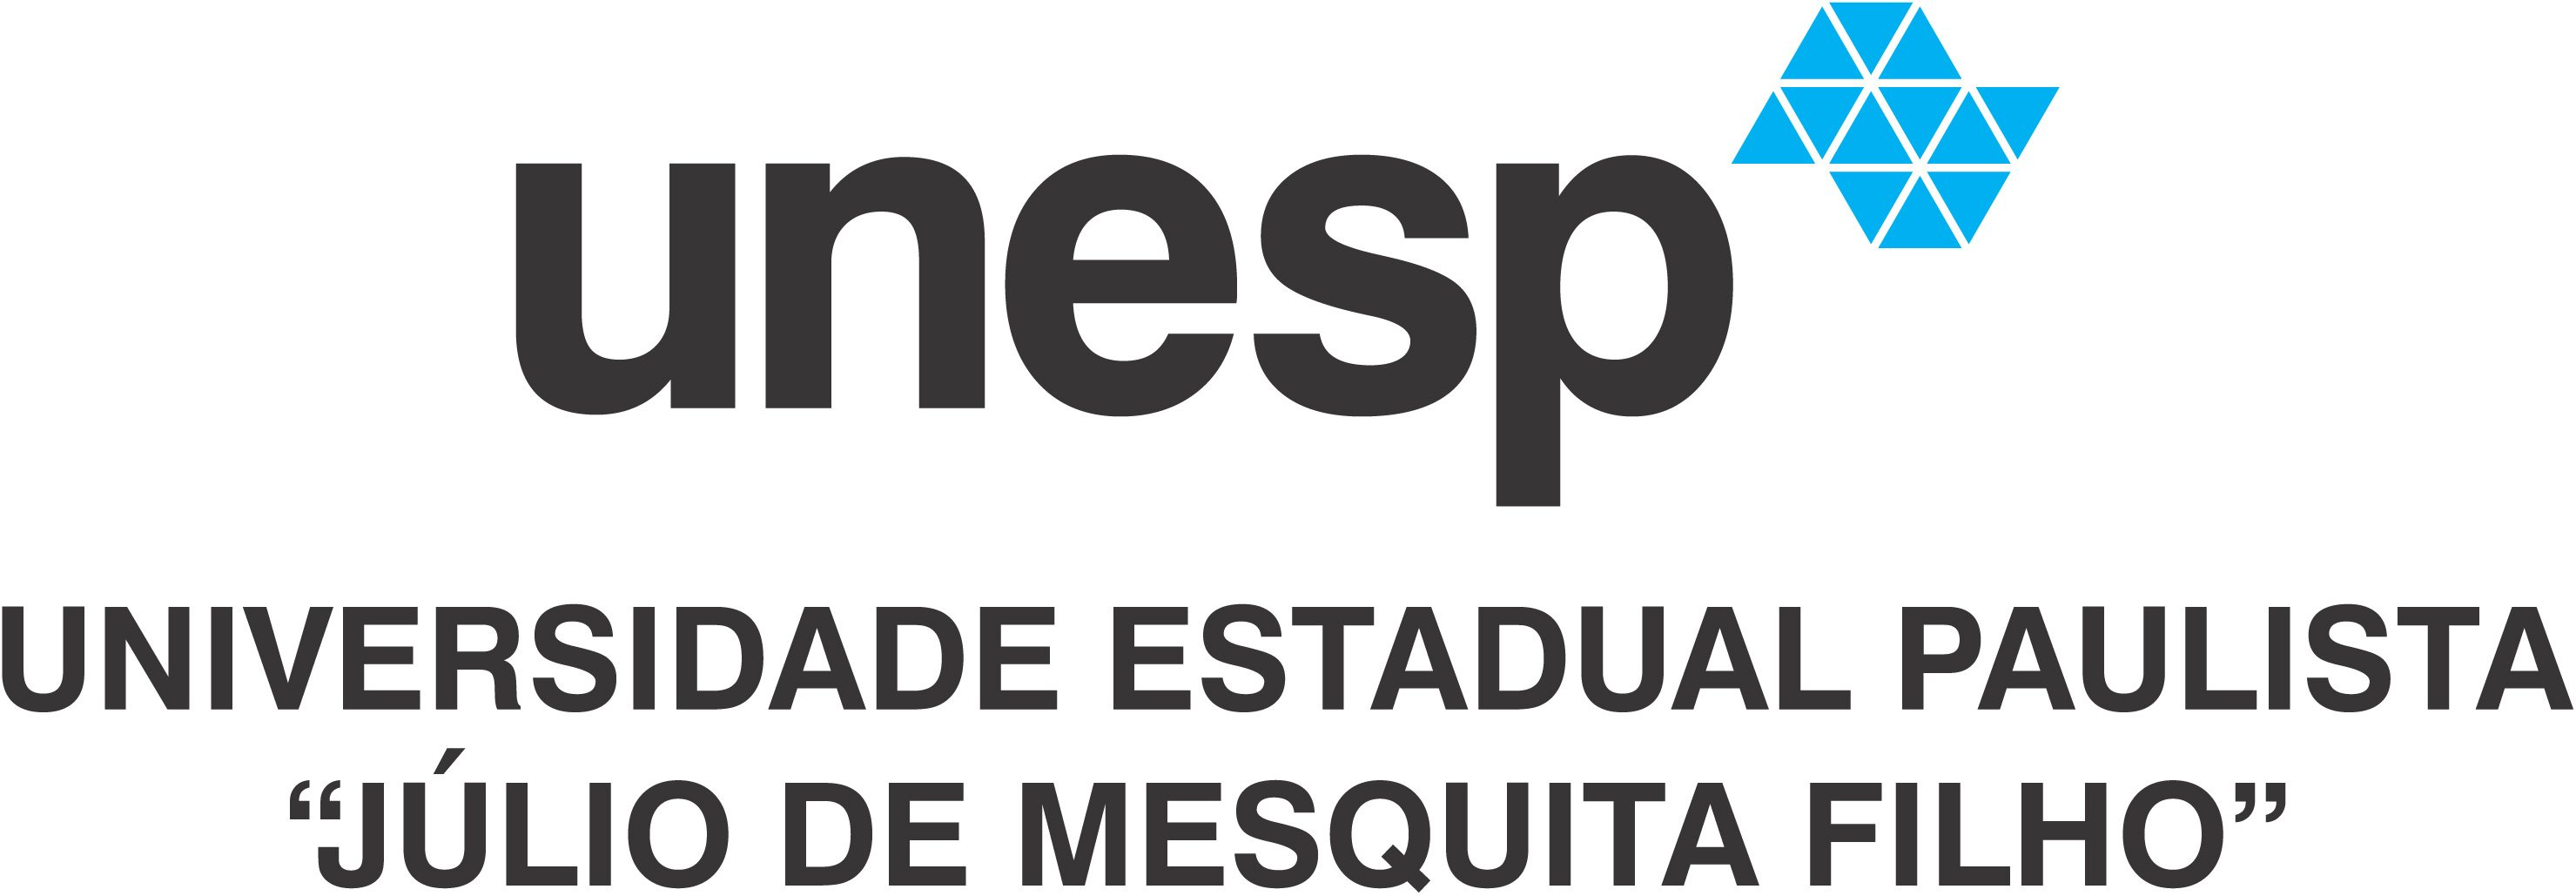 Vestibular UNESP